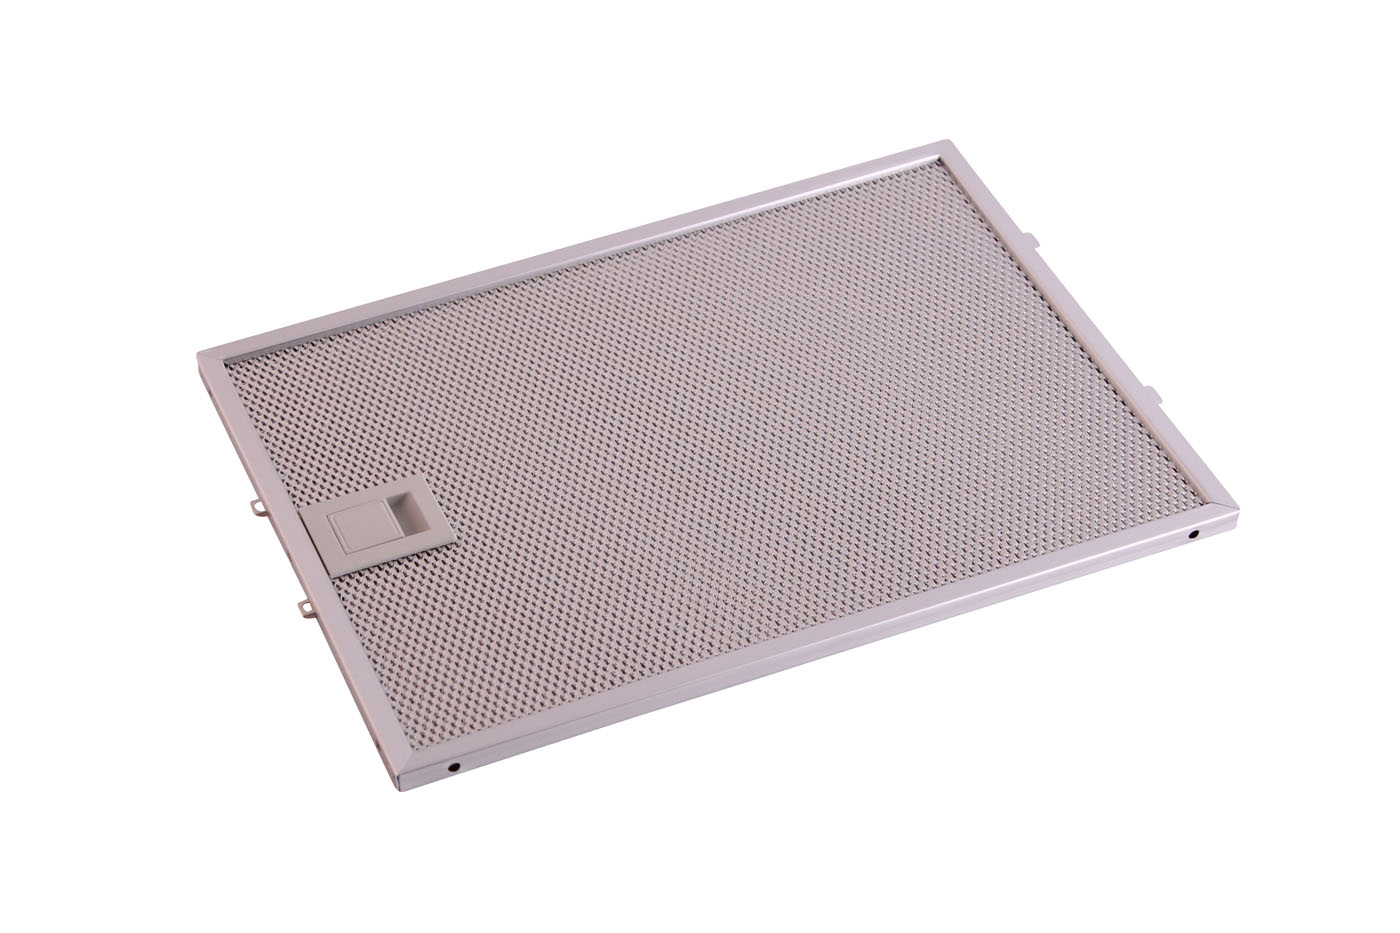 Novy aluminium filter 218 x 300 mm voor afzuigkap 508-900885